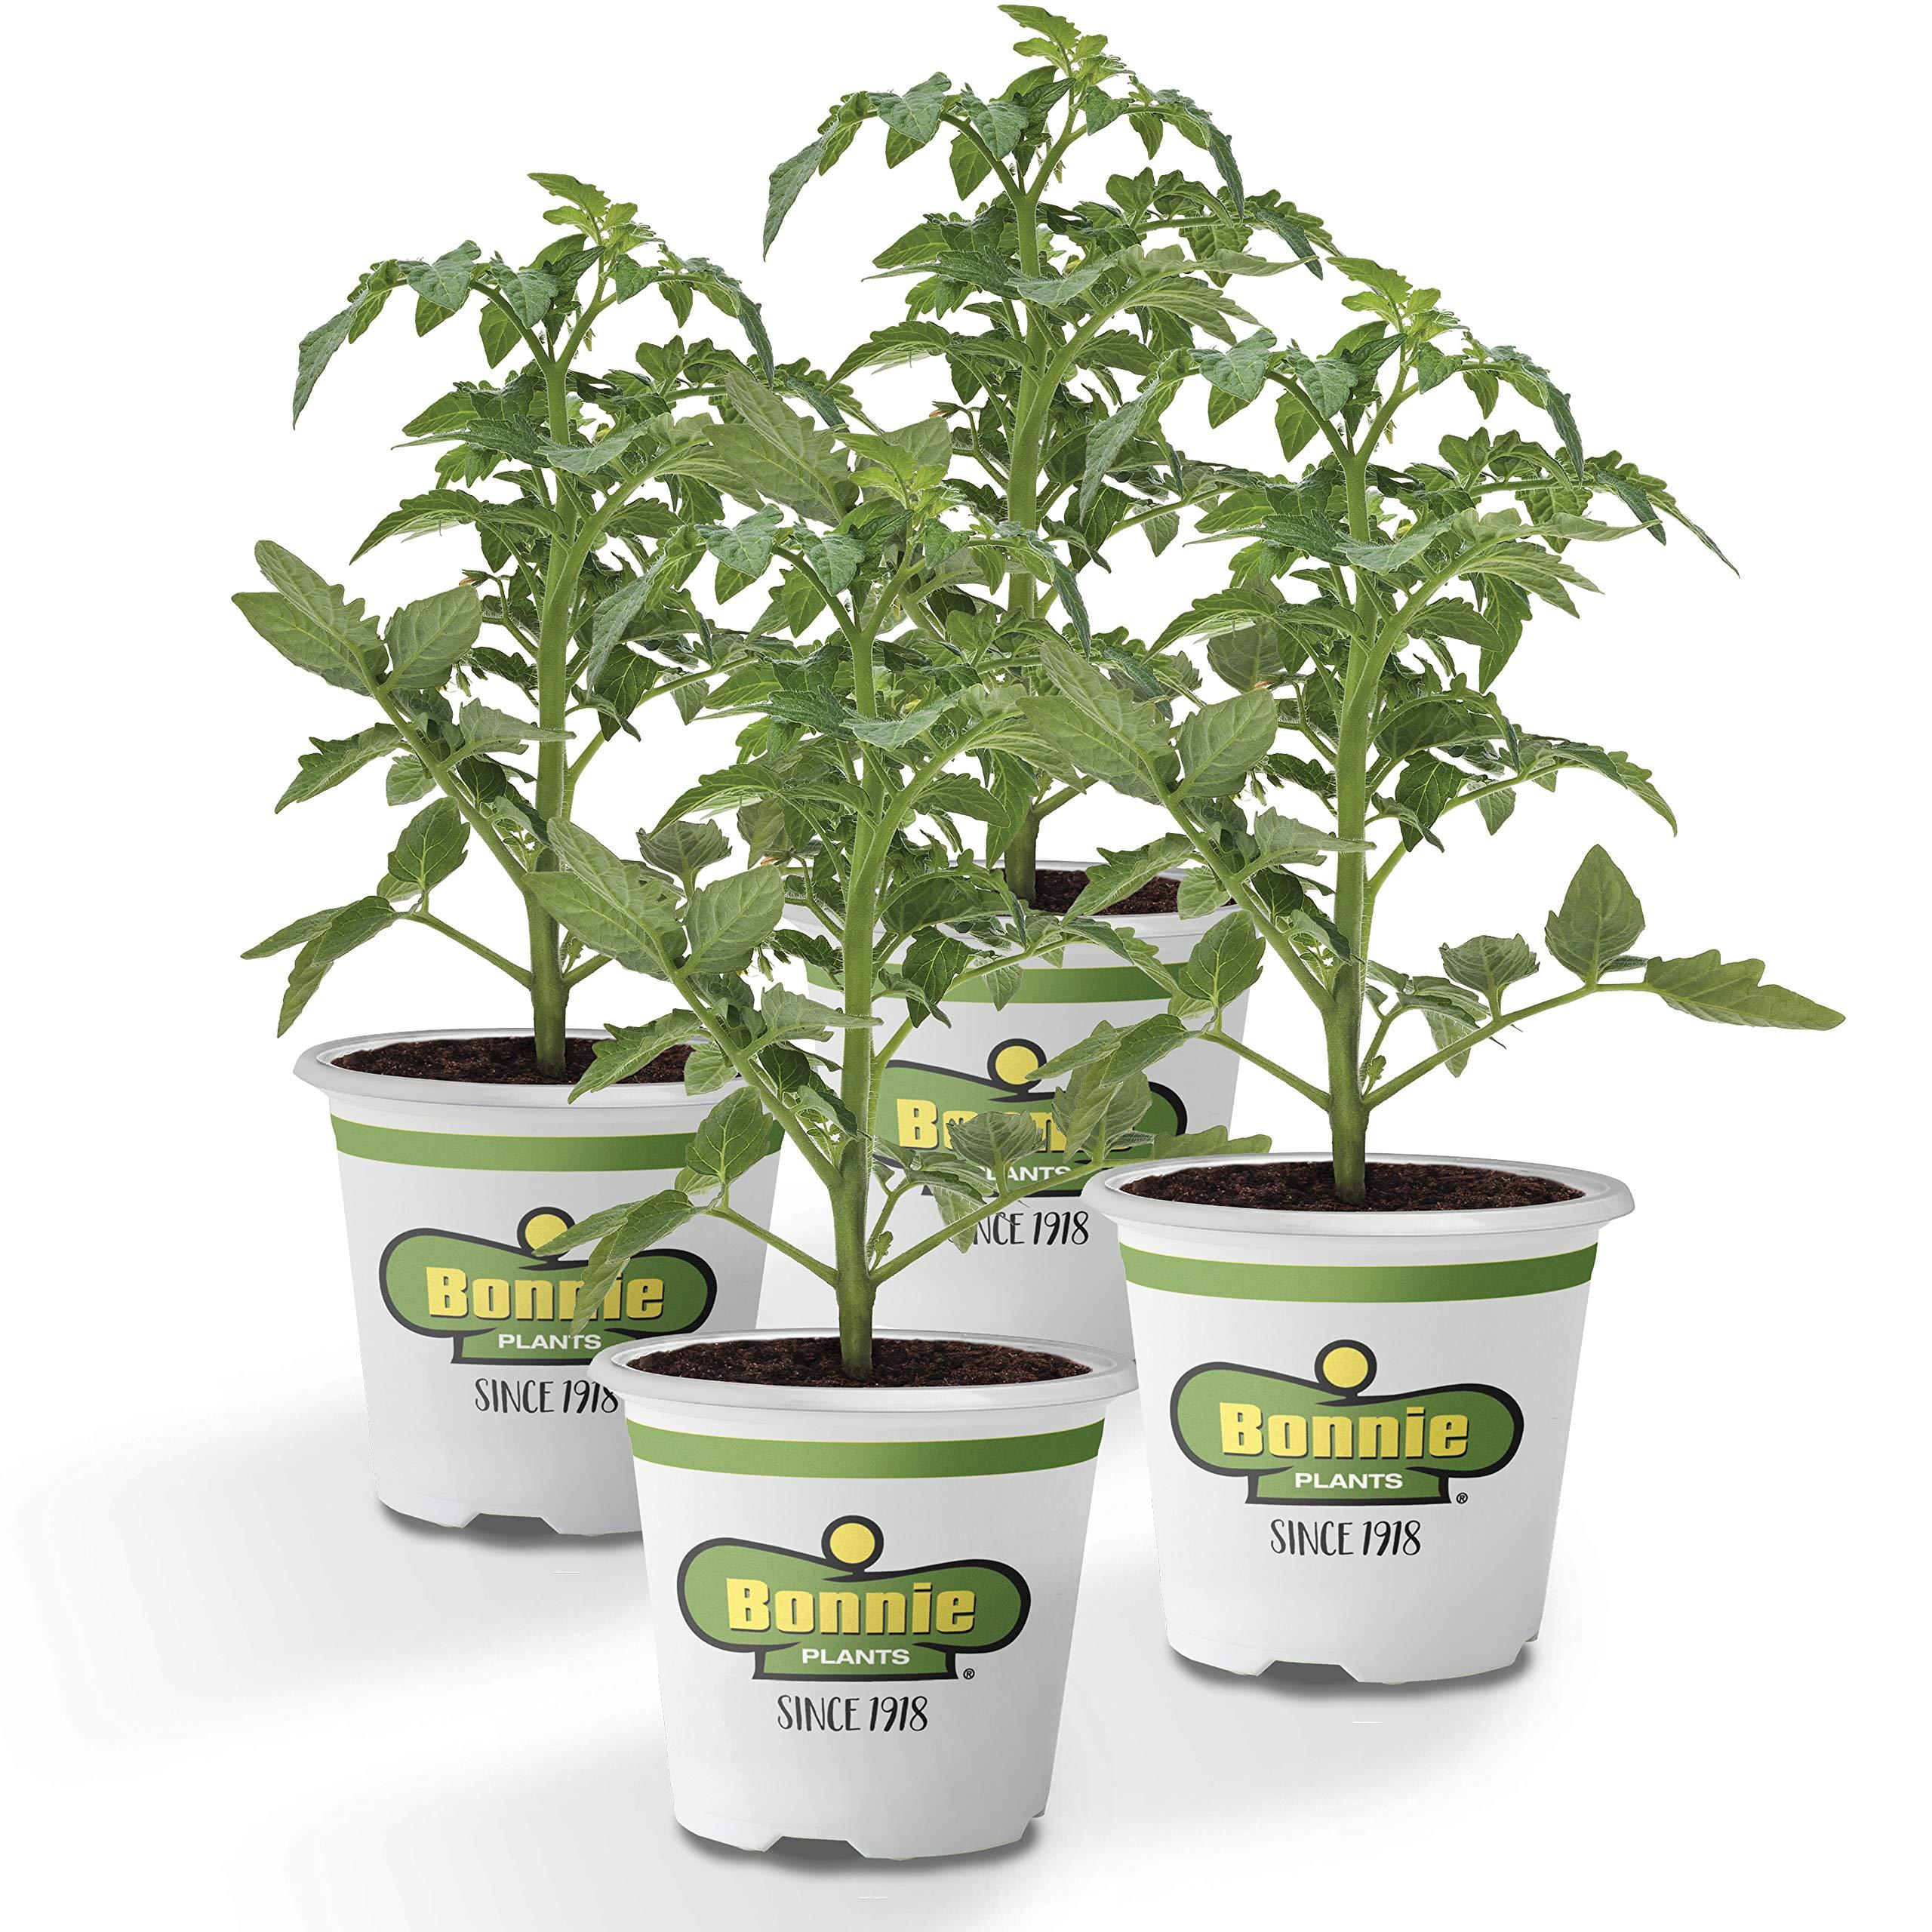 Bonnie Plants Cherokee Purple Heirloom Tomato (4 Pack) Live Plants by Bonnie Plants (Image #1)